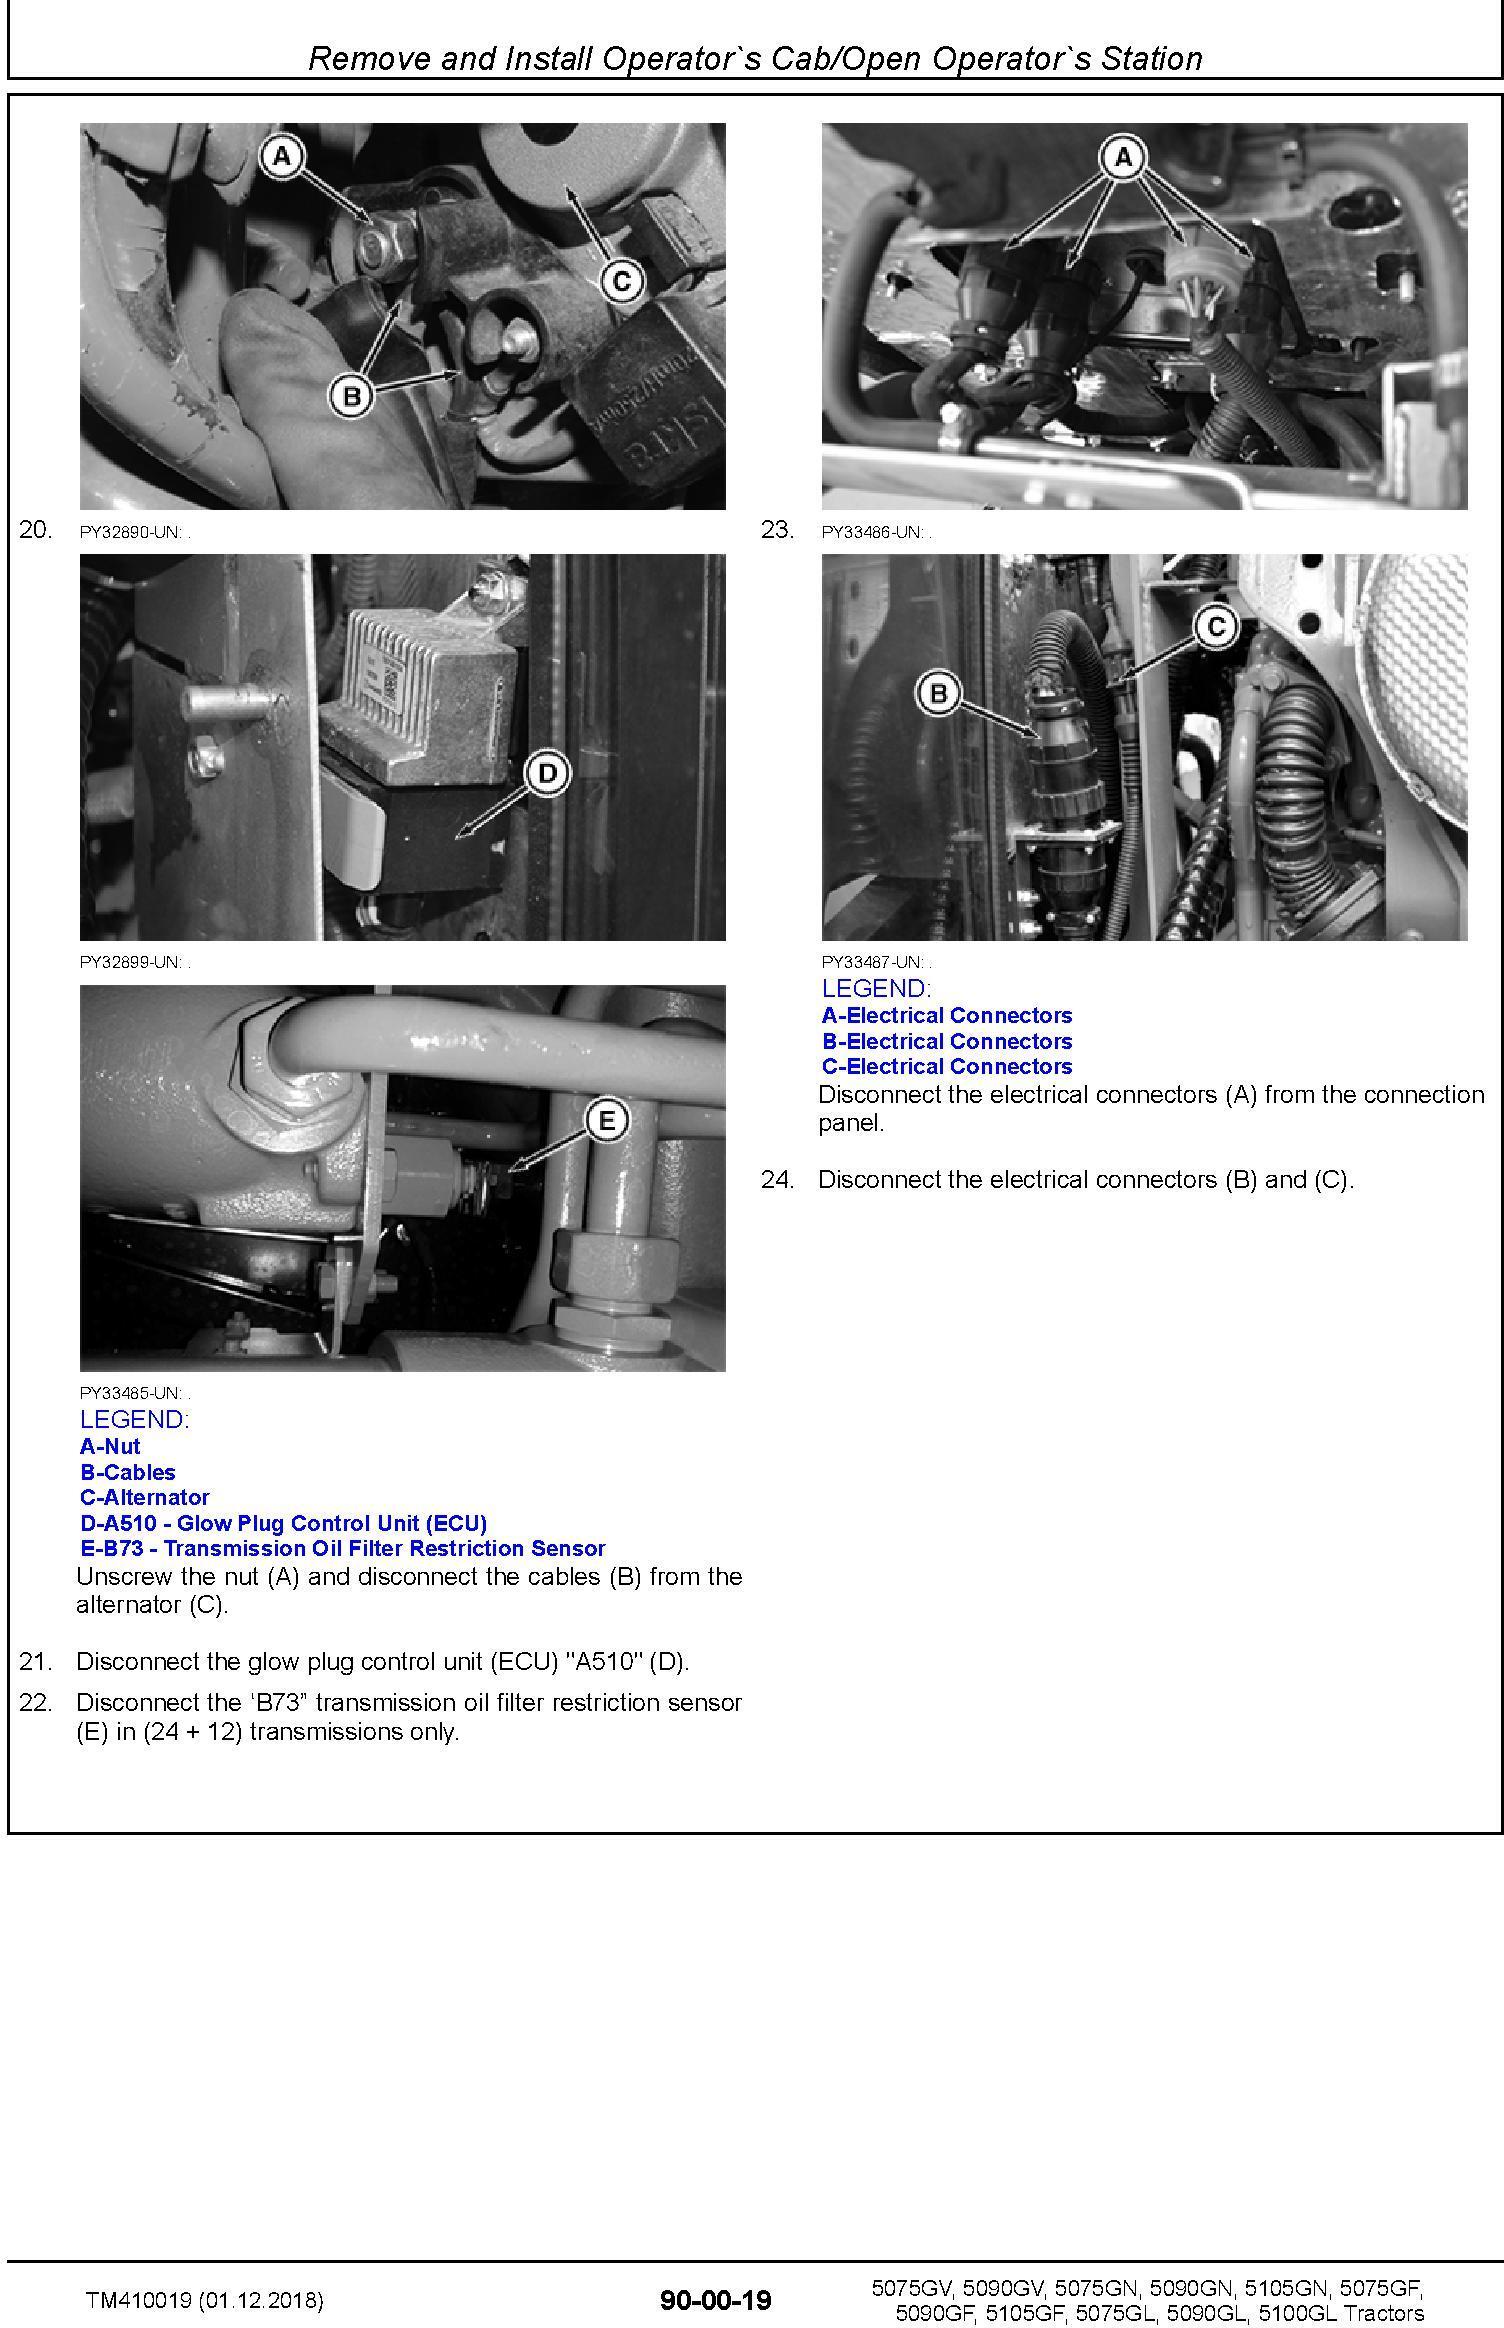 John Deere 5075GF/L/N/V, 5090GF/L/N/V, 5100GL, 5105GF/N Tractors Repair Technical Manual (TM410019) - 3